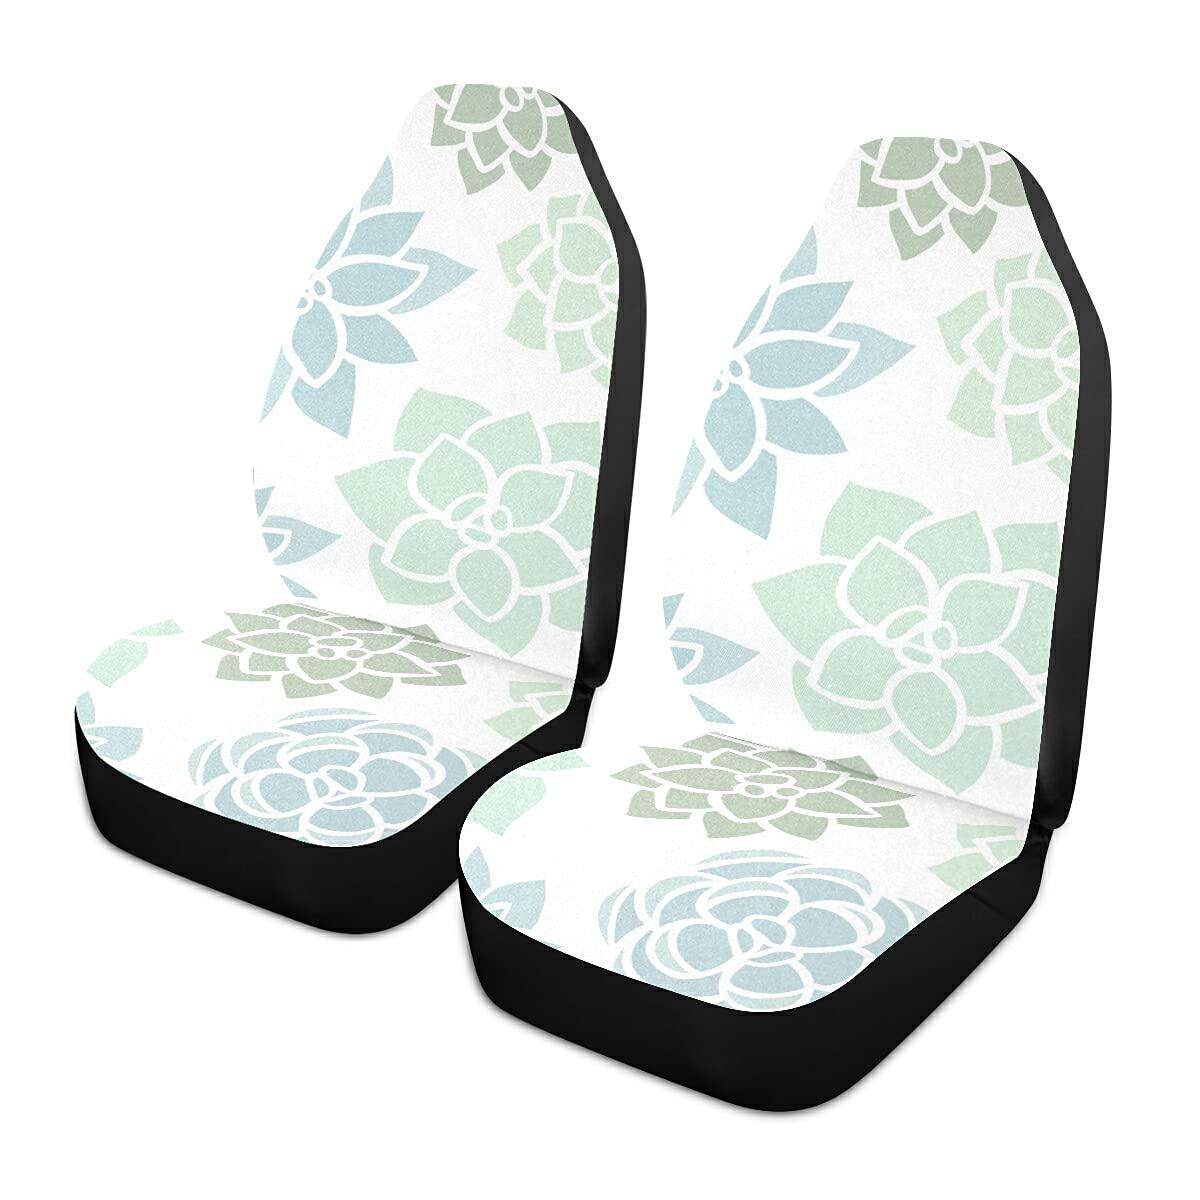 ALAZA latest Cactus Cacti Genuine Succulent Flower Seat Seats Covers Front Car